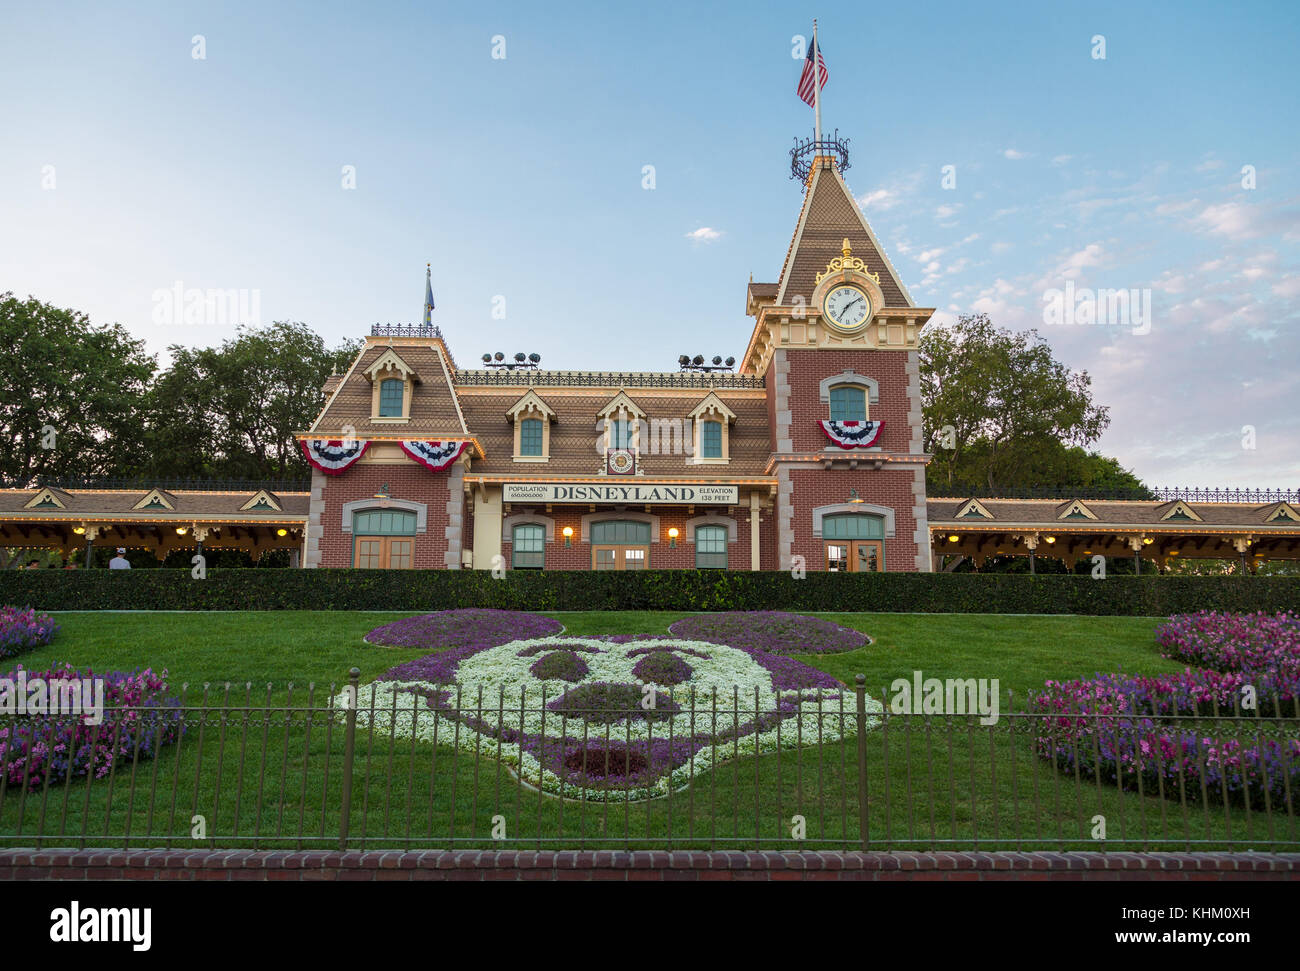 Disneyland Anaheim Mickey Stock Photos Disneyland